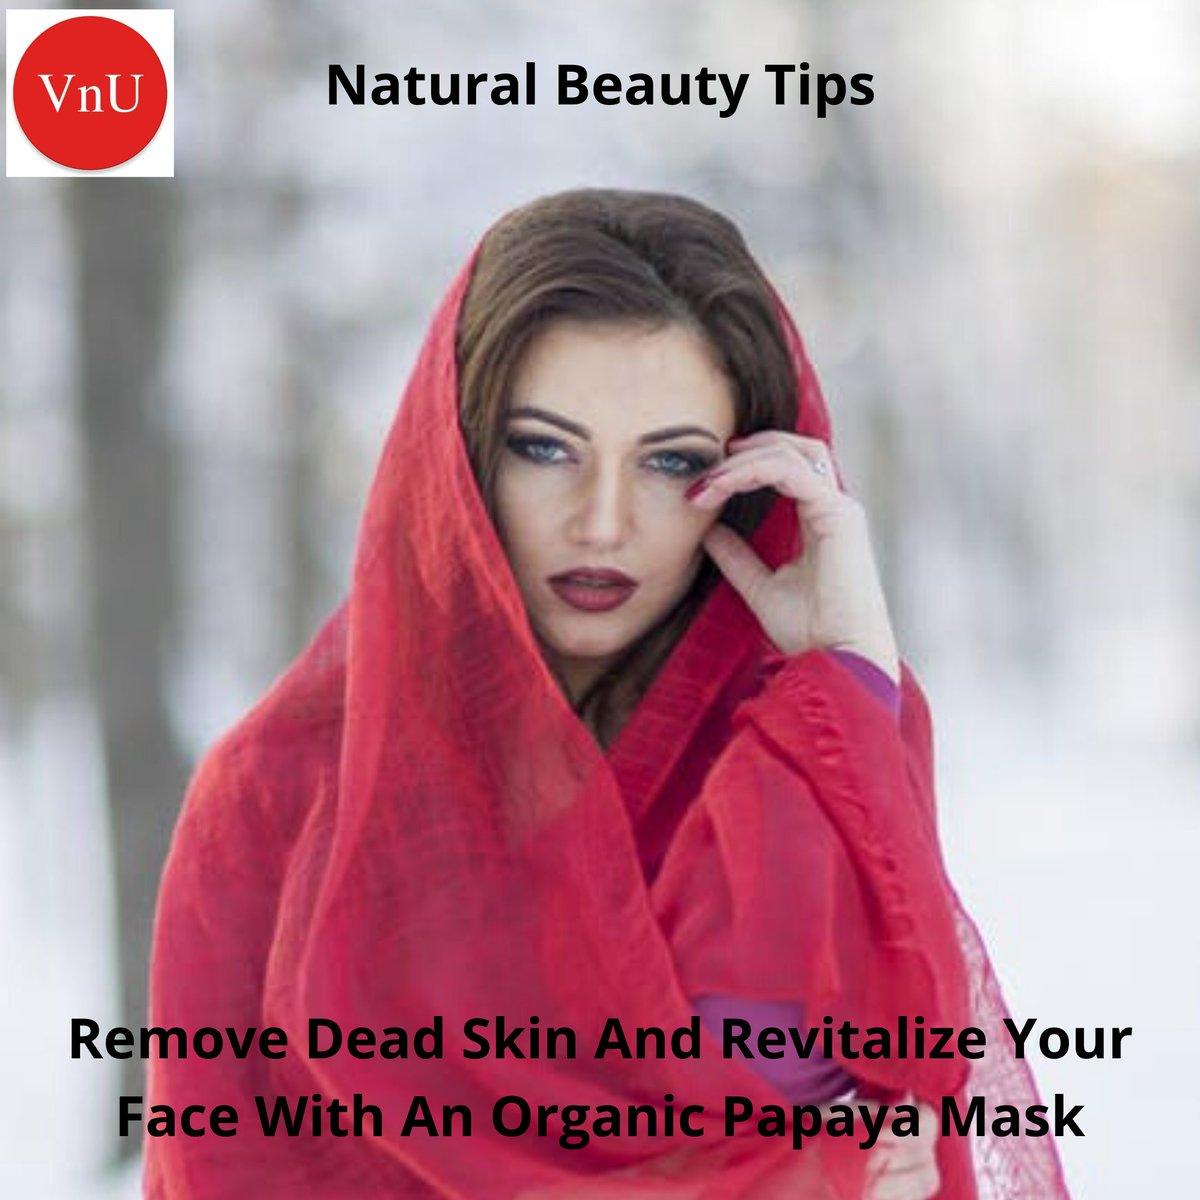 #naturalbeauty  #beautytips  #bebeautiful  #beautiful  #organic  #fashion  #girl  #vnufashion  #love  #onlineshopping  #fashiontips